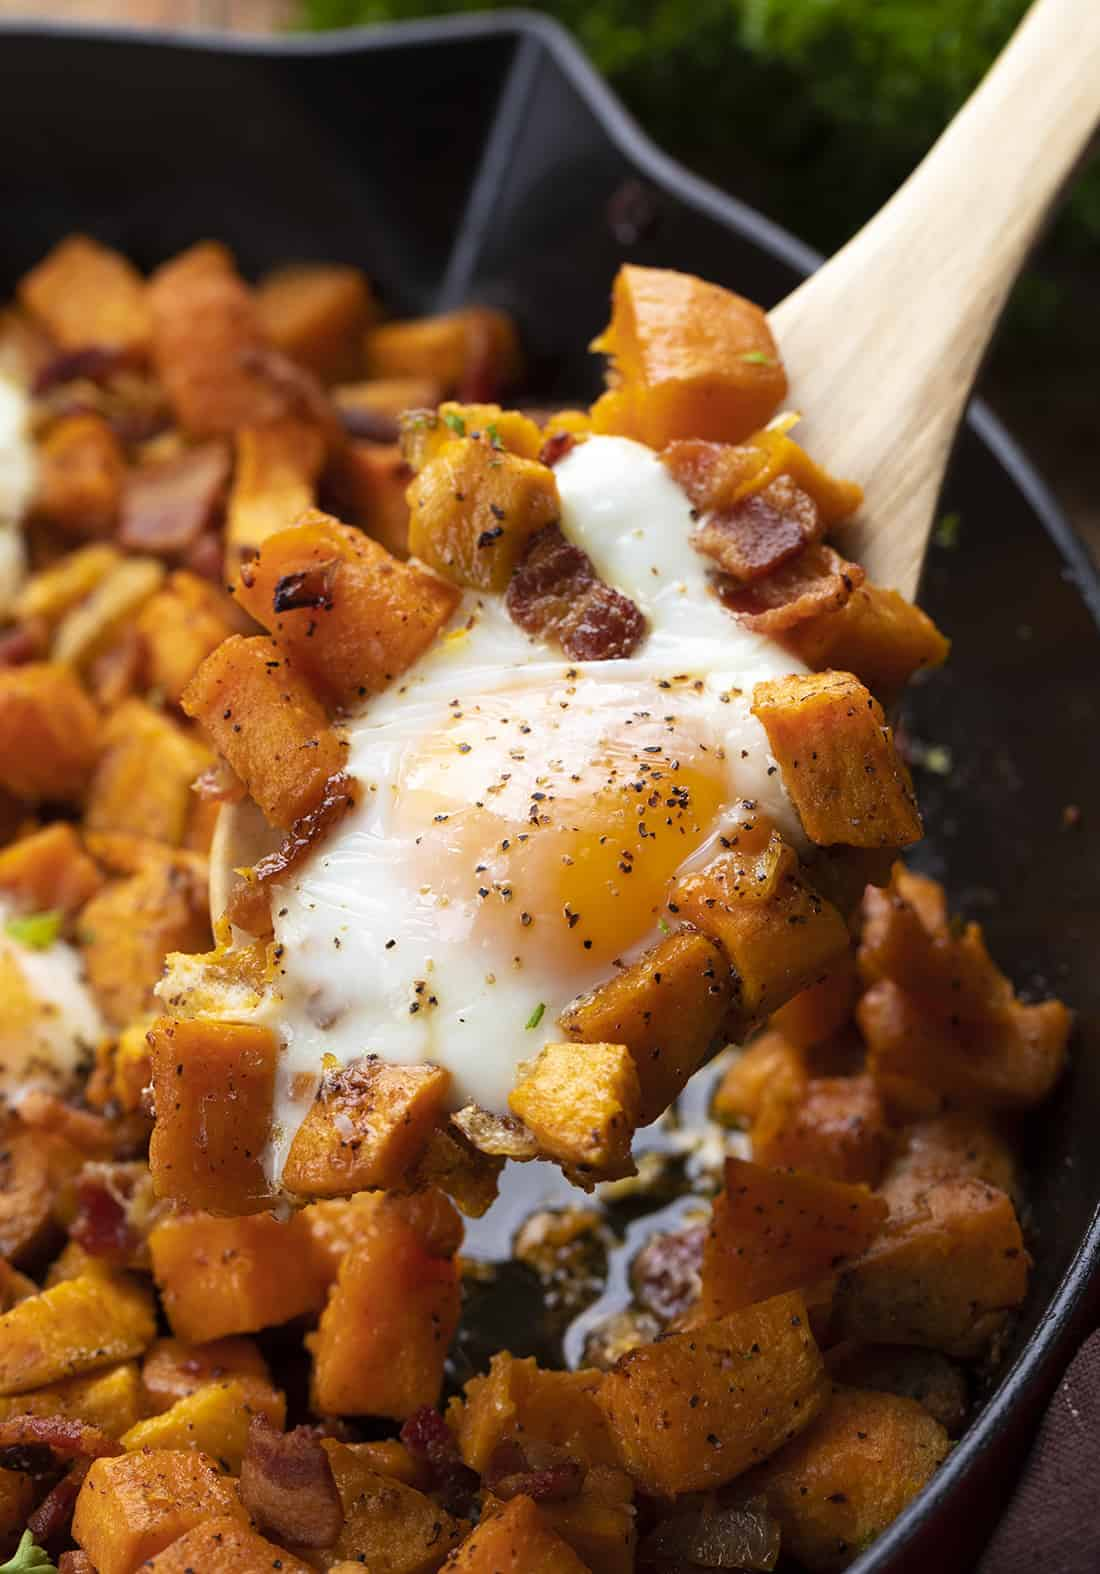 Wooden Spoon Picking up Sweet Potato Hash